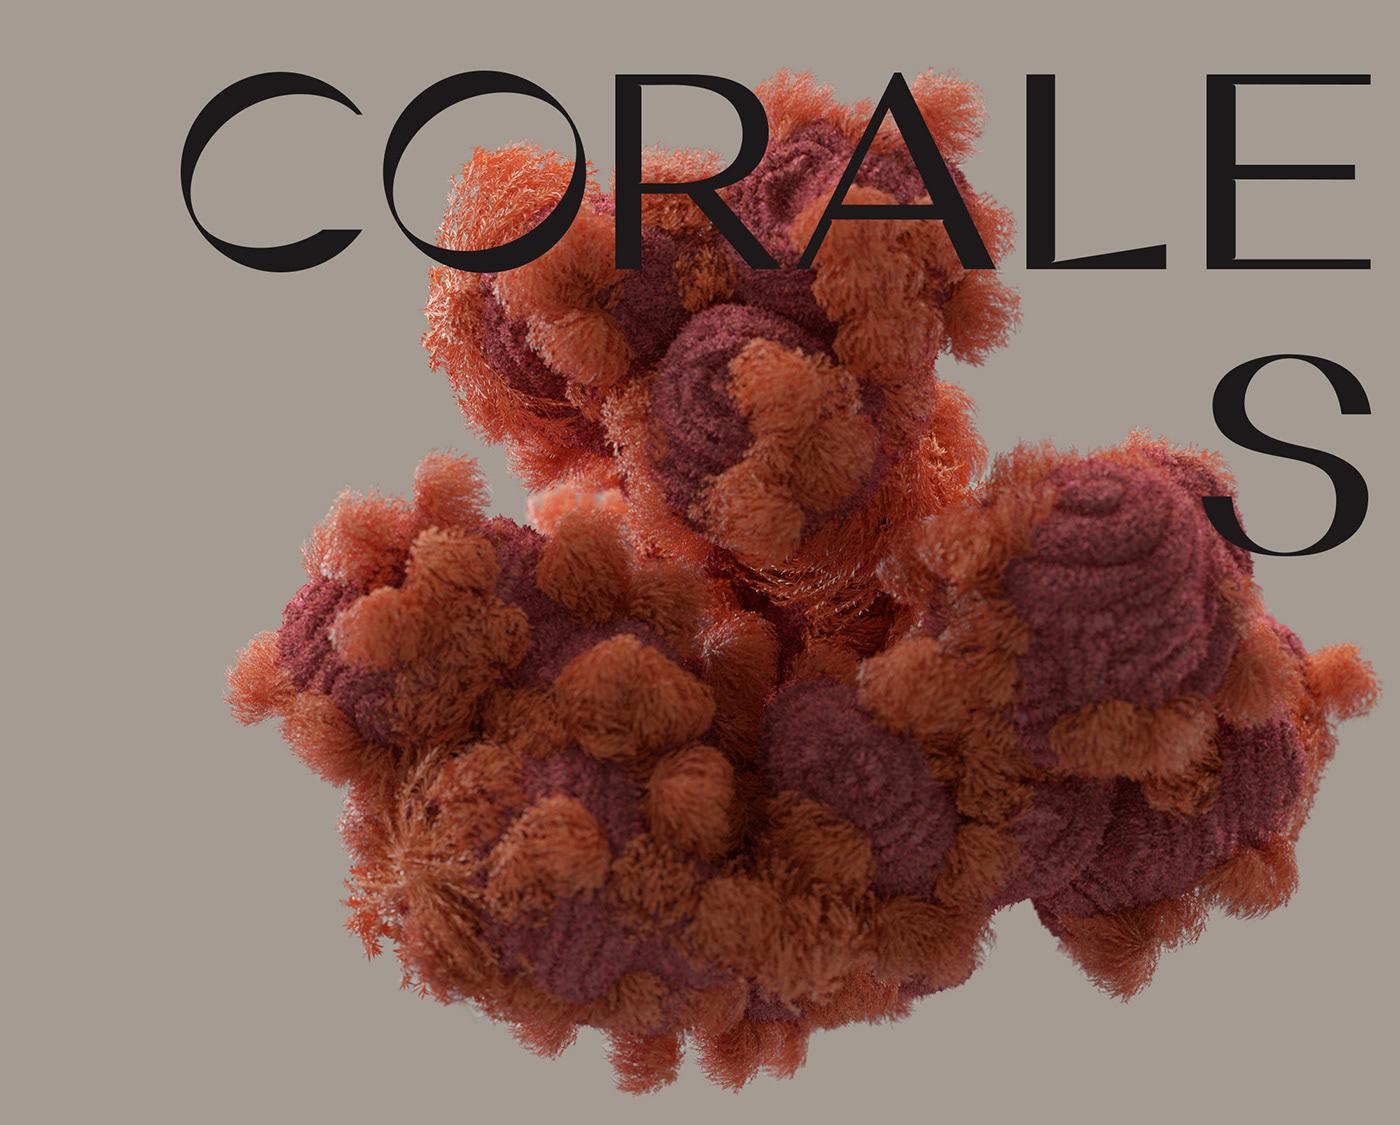 3D artwork c4d CGI colorful coral organic rock seabed visual